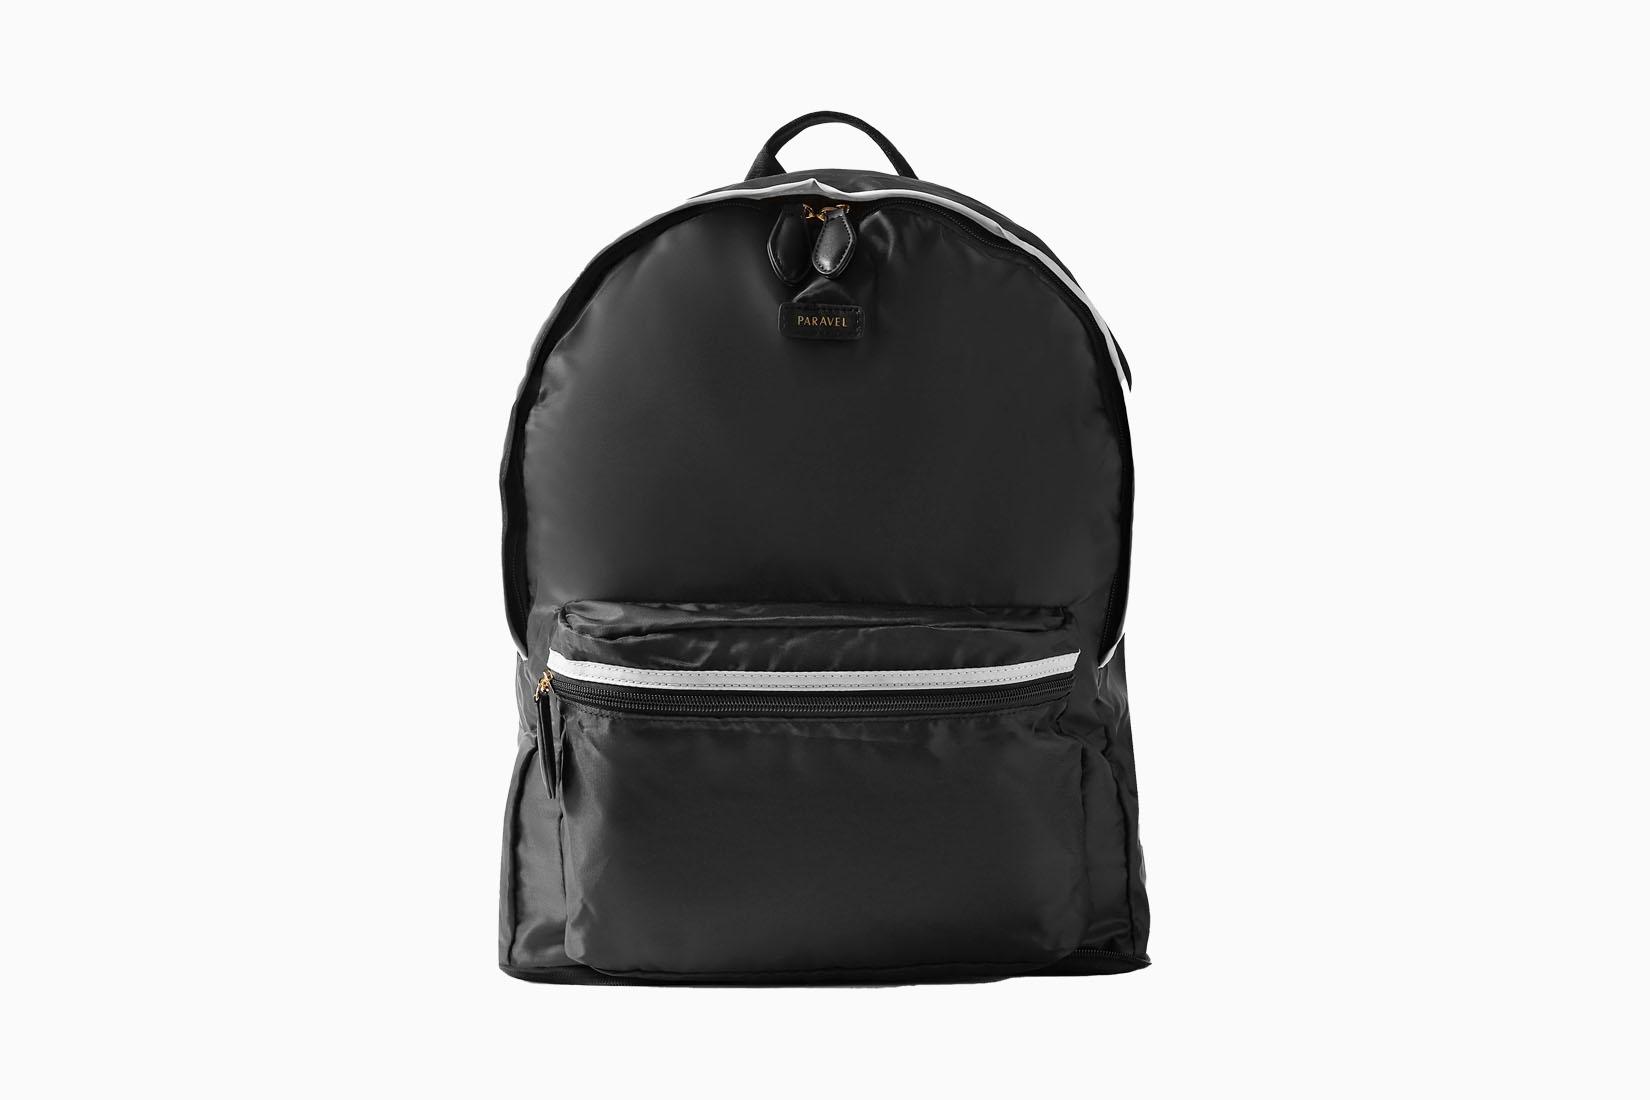 best backpacks women paravel review Luxe Digital